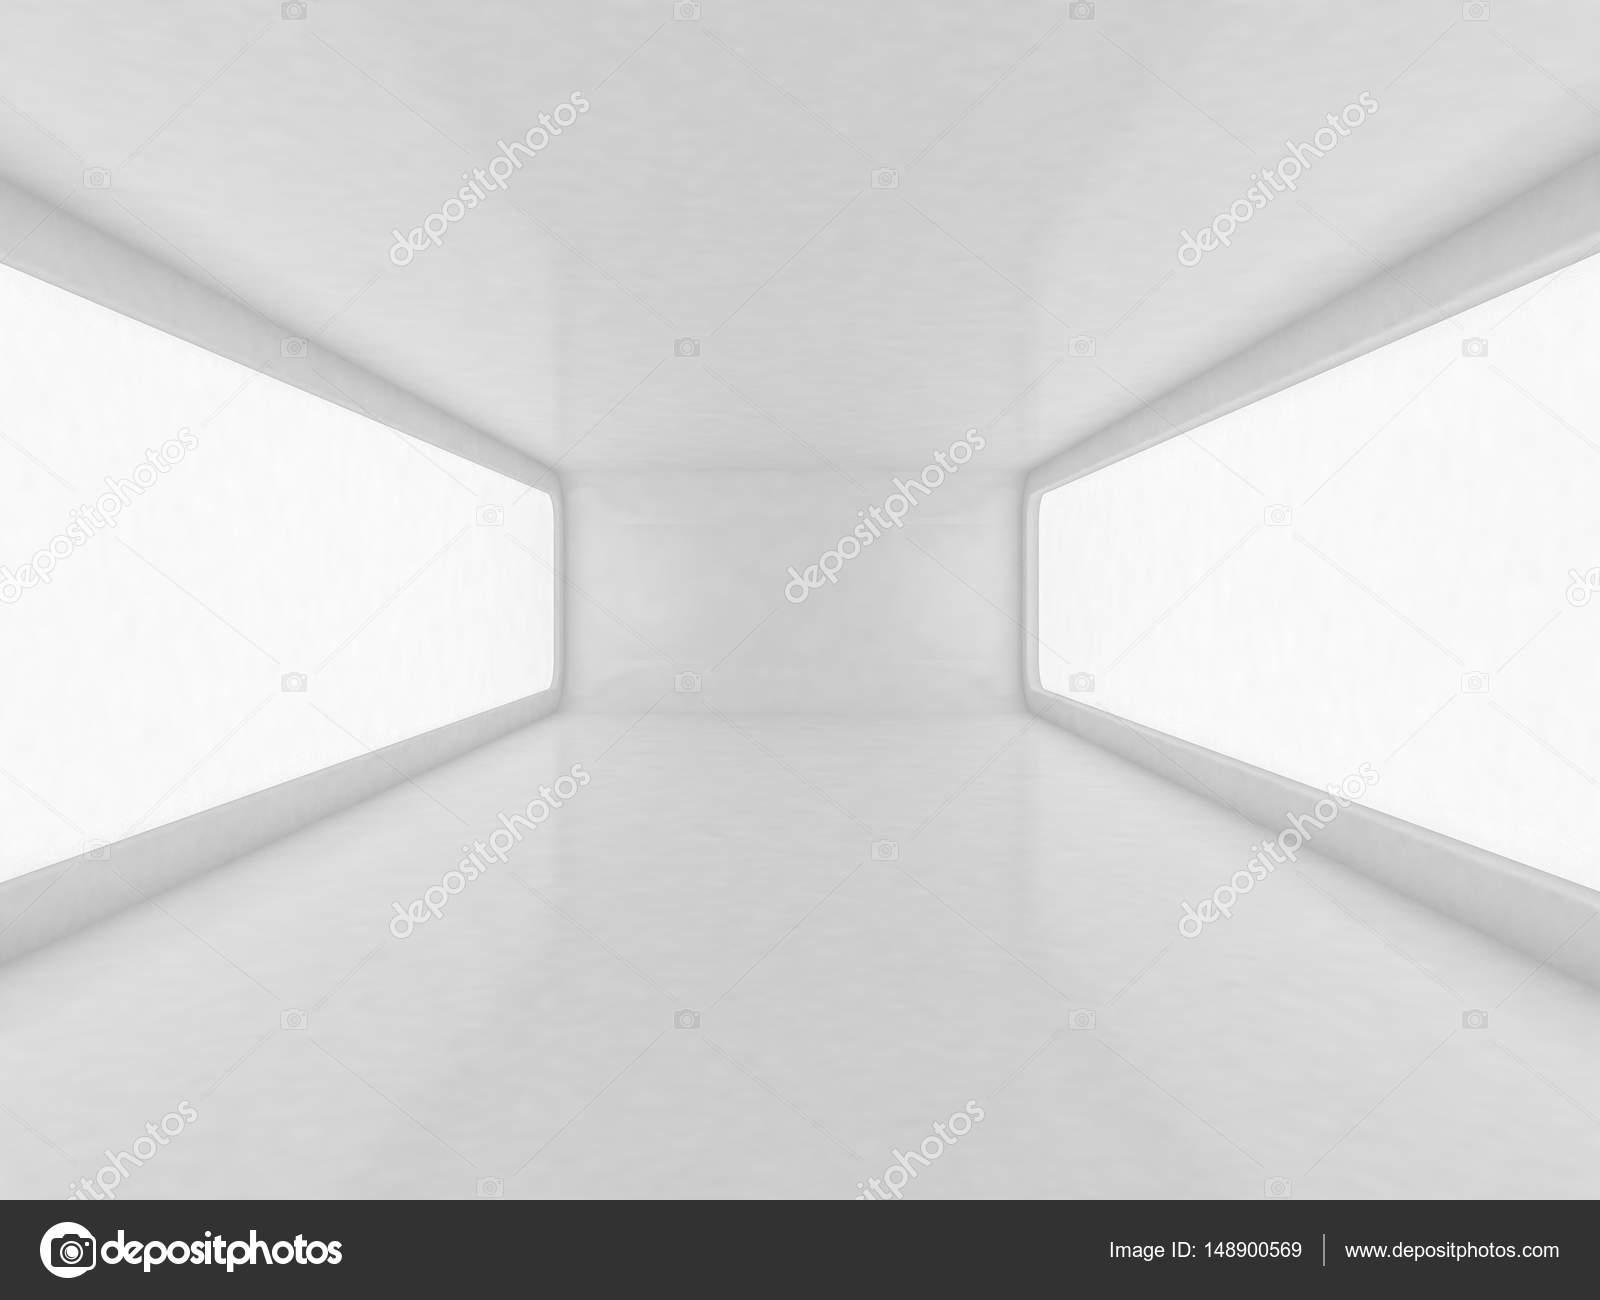 Futuristic white room